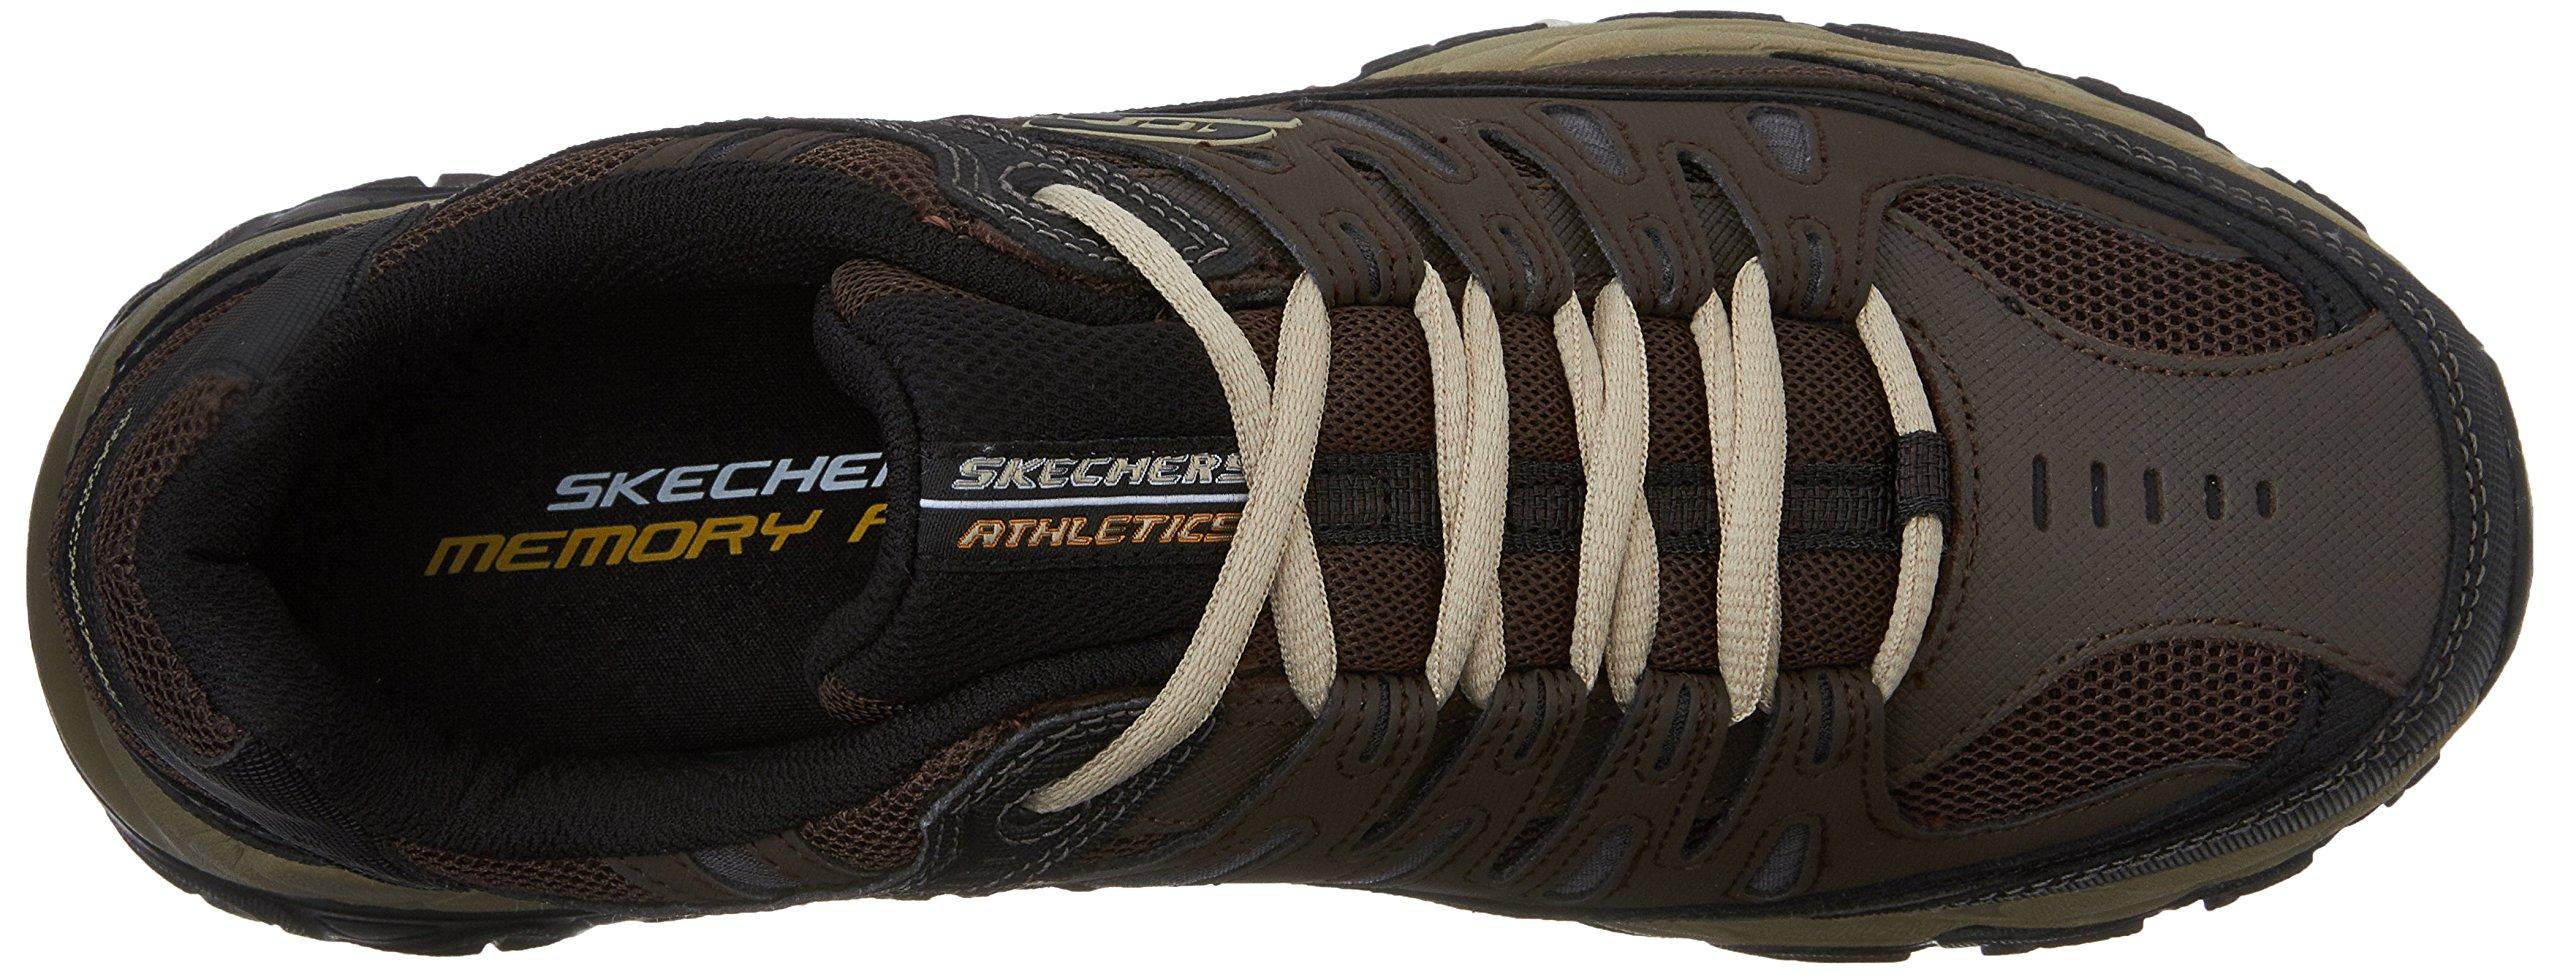 Skechers Men's AFTERBURNM.FIT Memory Foam Lace-Up Sneaker, Brown/Taupe, 7 M US by Skechers (Image #8)